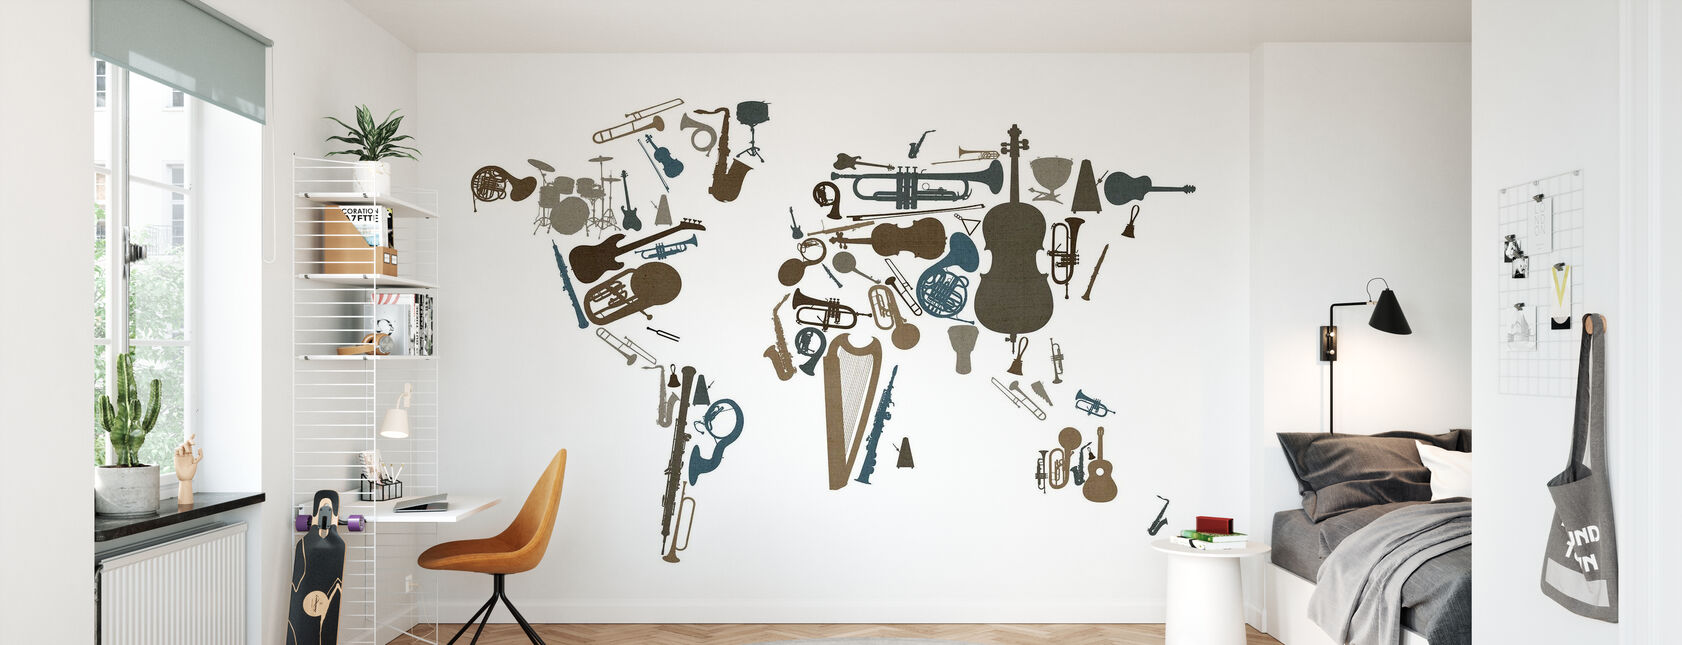 Music Instruments World Map - Wallpaper - Kids Room